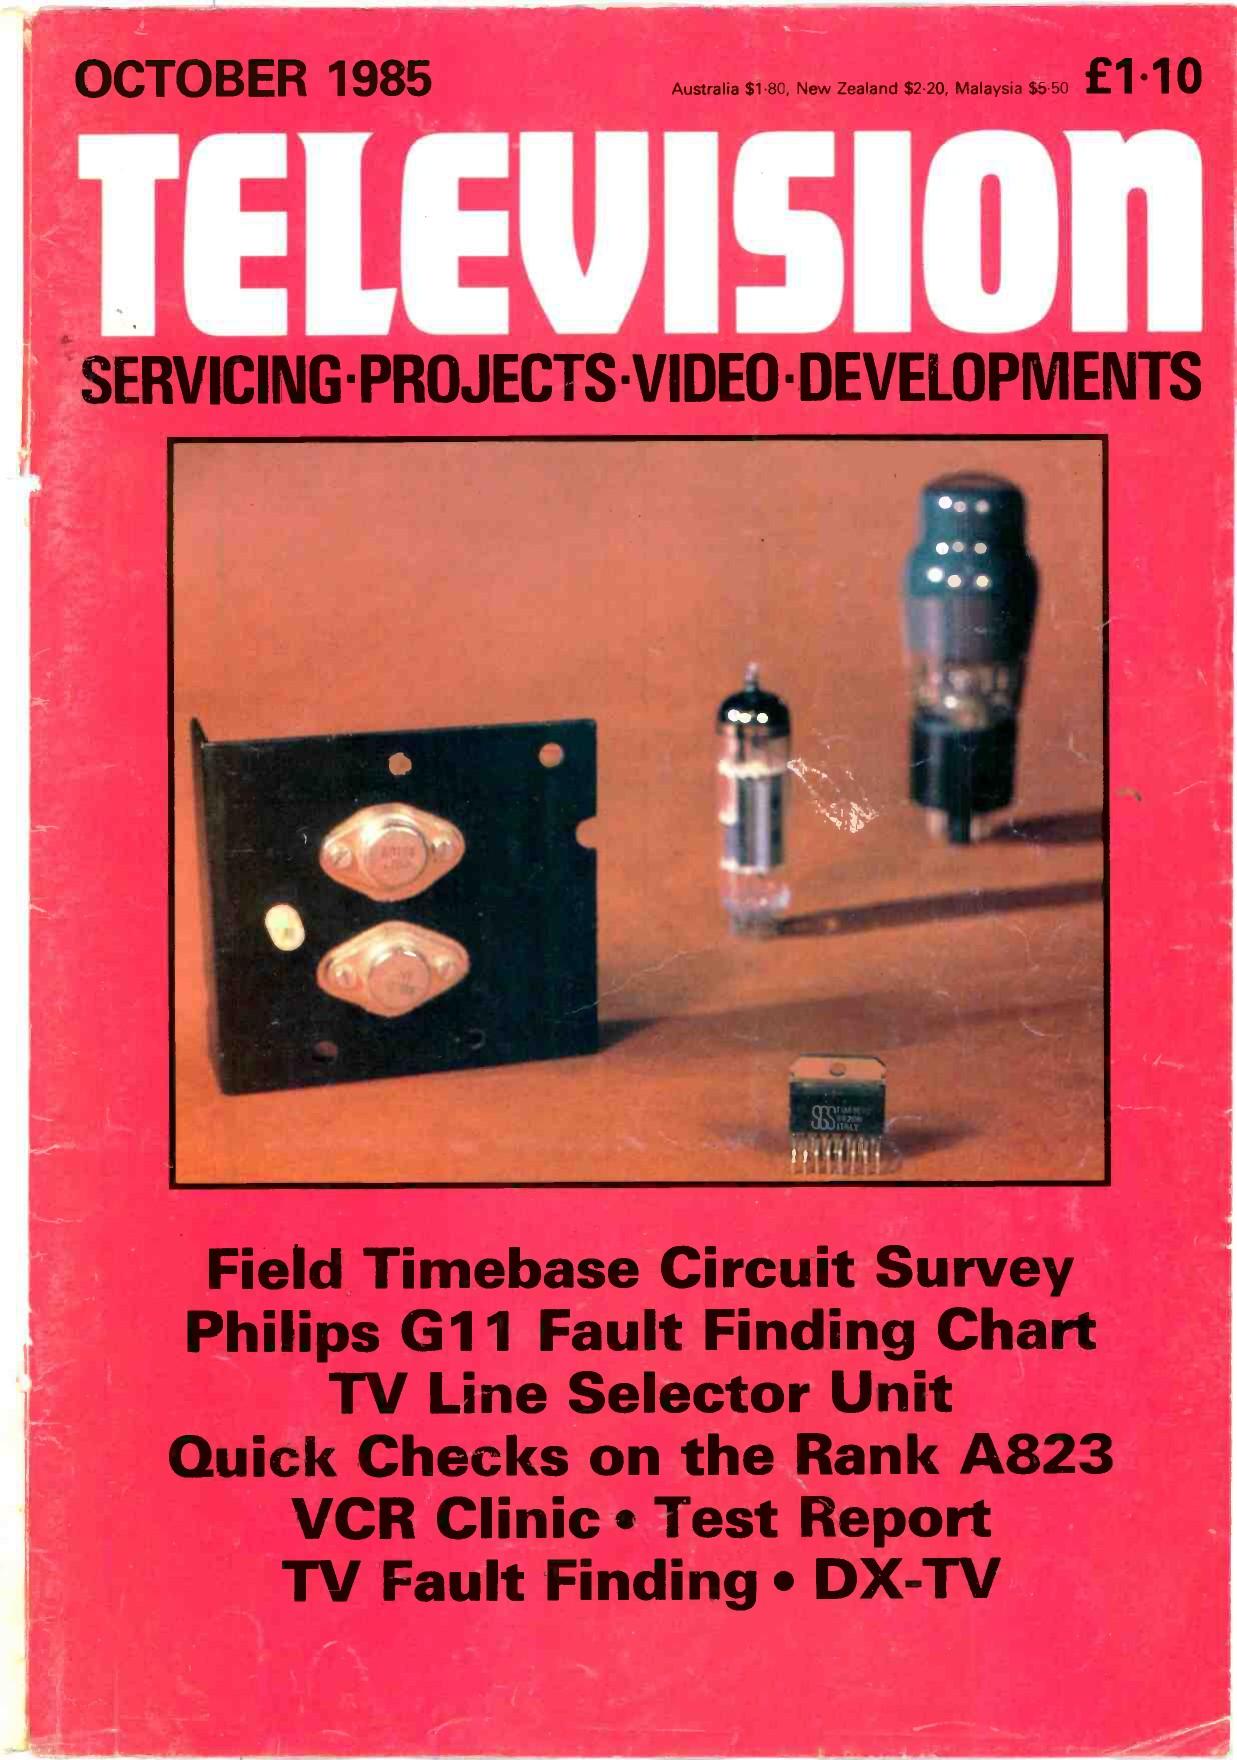 Tda 2040 25w Audio Amp Schematic Oct American Radio History Of Tda 2040 25w Audio Amp Schematic